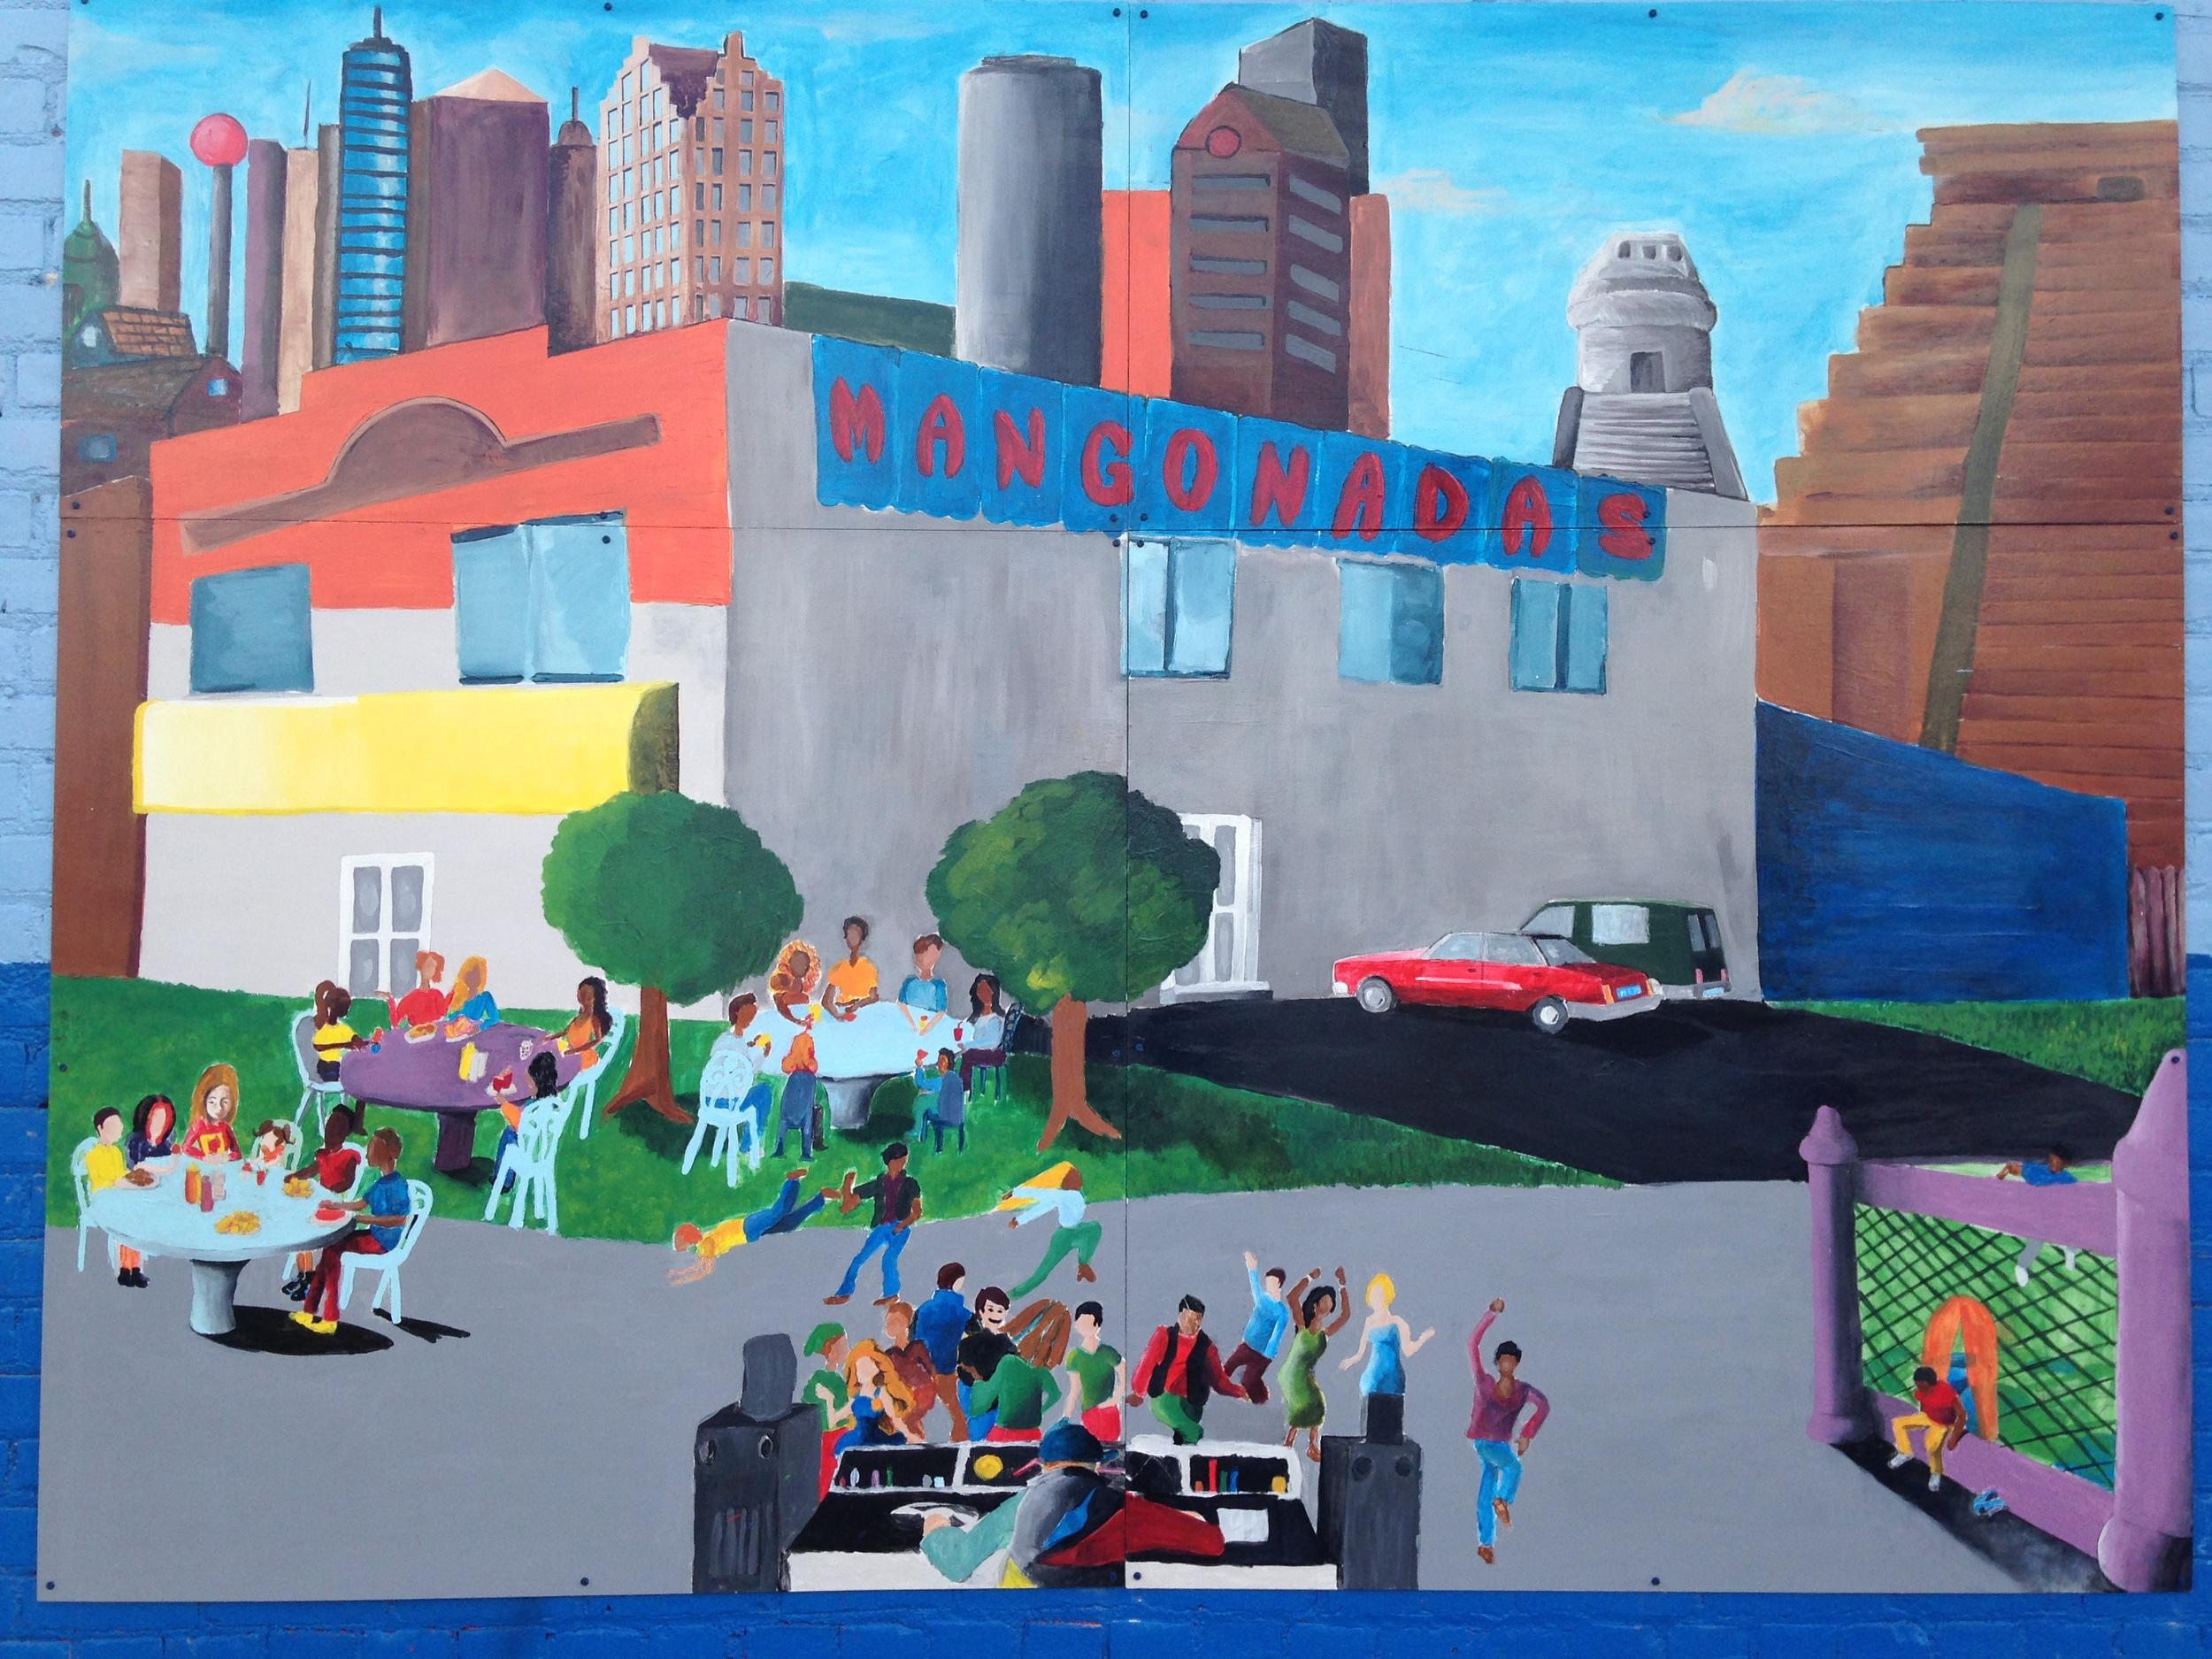 Mural on Mangonadas Ice Cream Shop Spring 2013